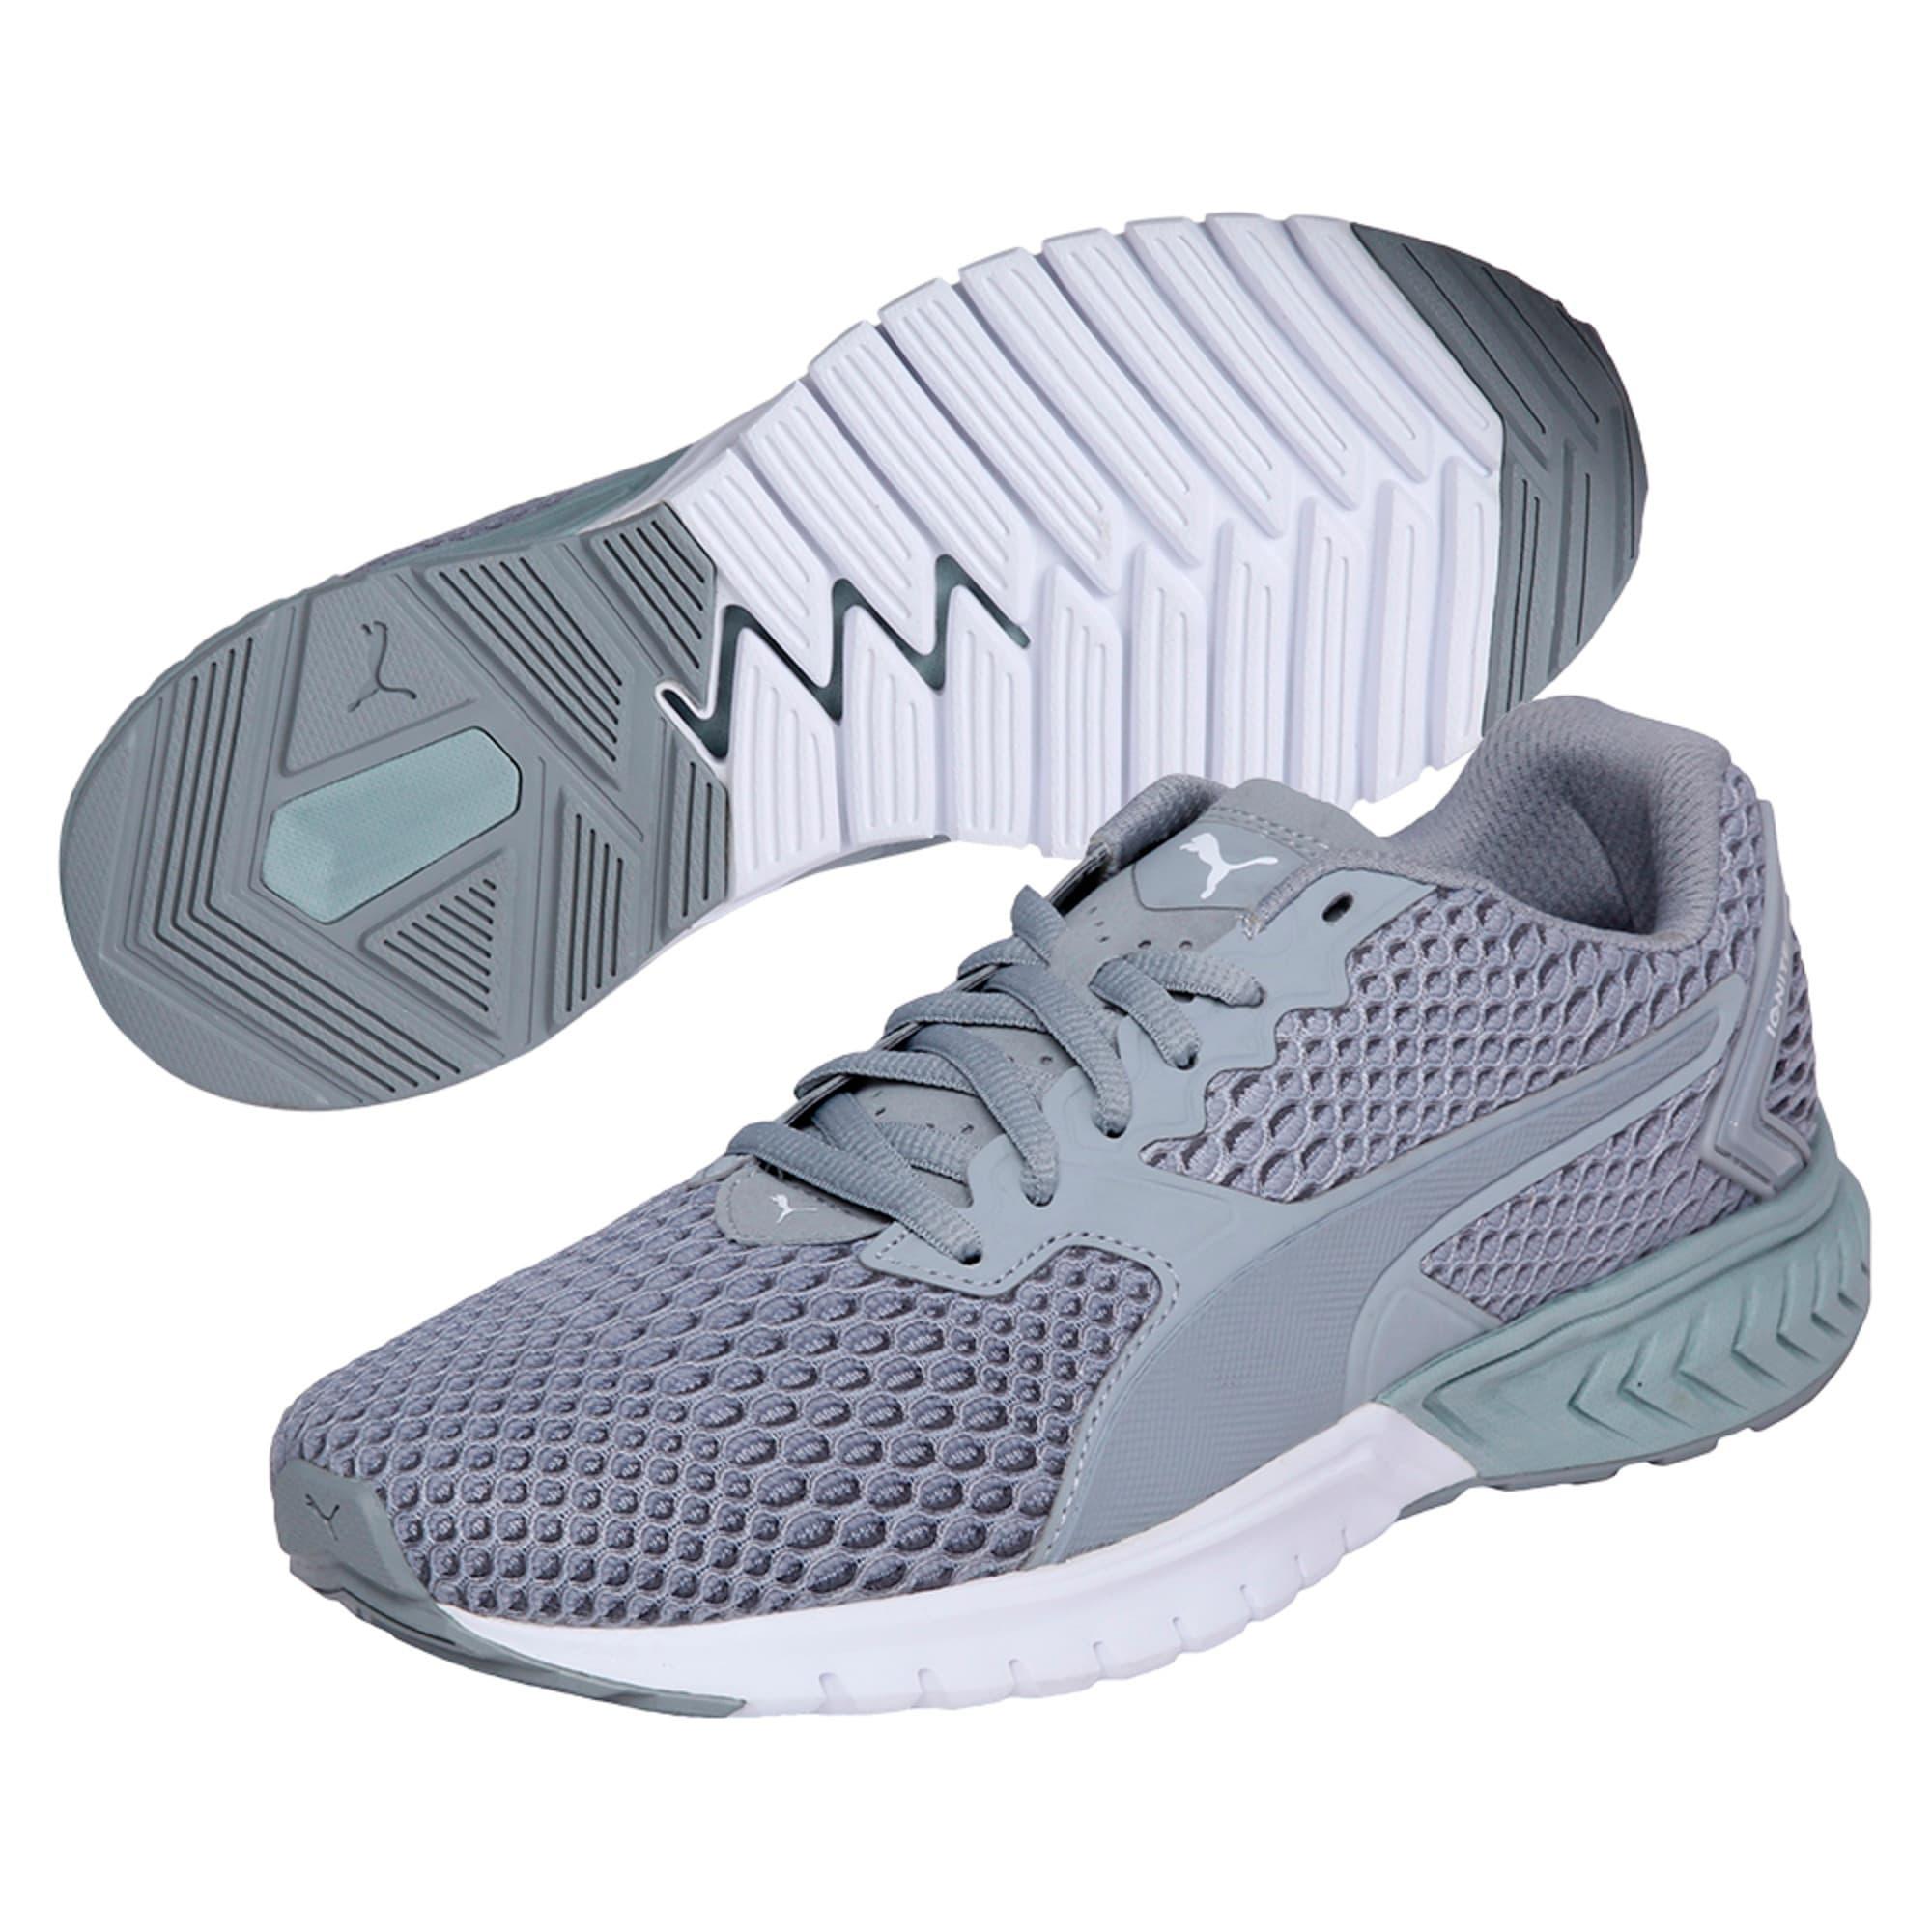 Thumbnail 5 of IGNITE Dual New Core Women's Training Shoes, Quarry-QUIET SHADE, medium-IND